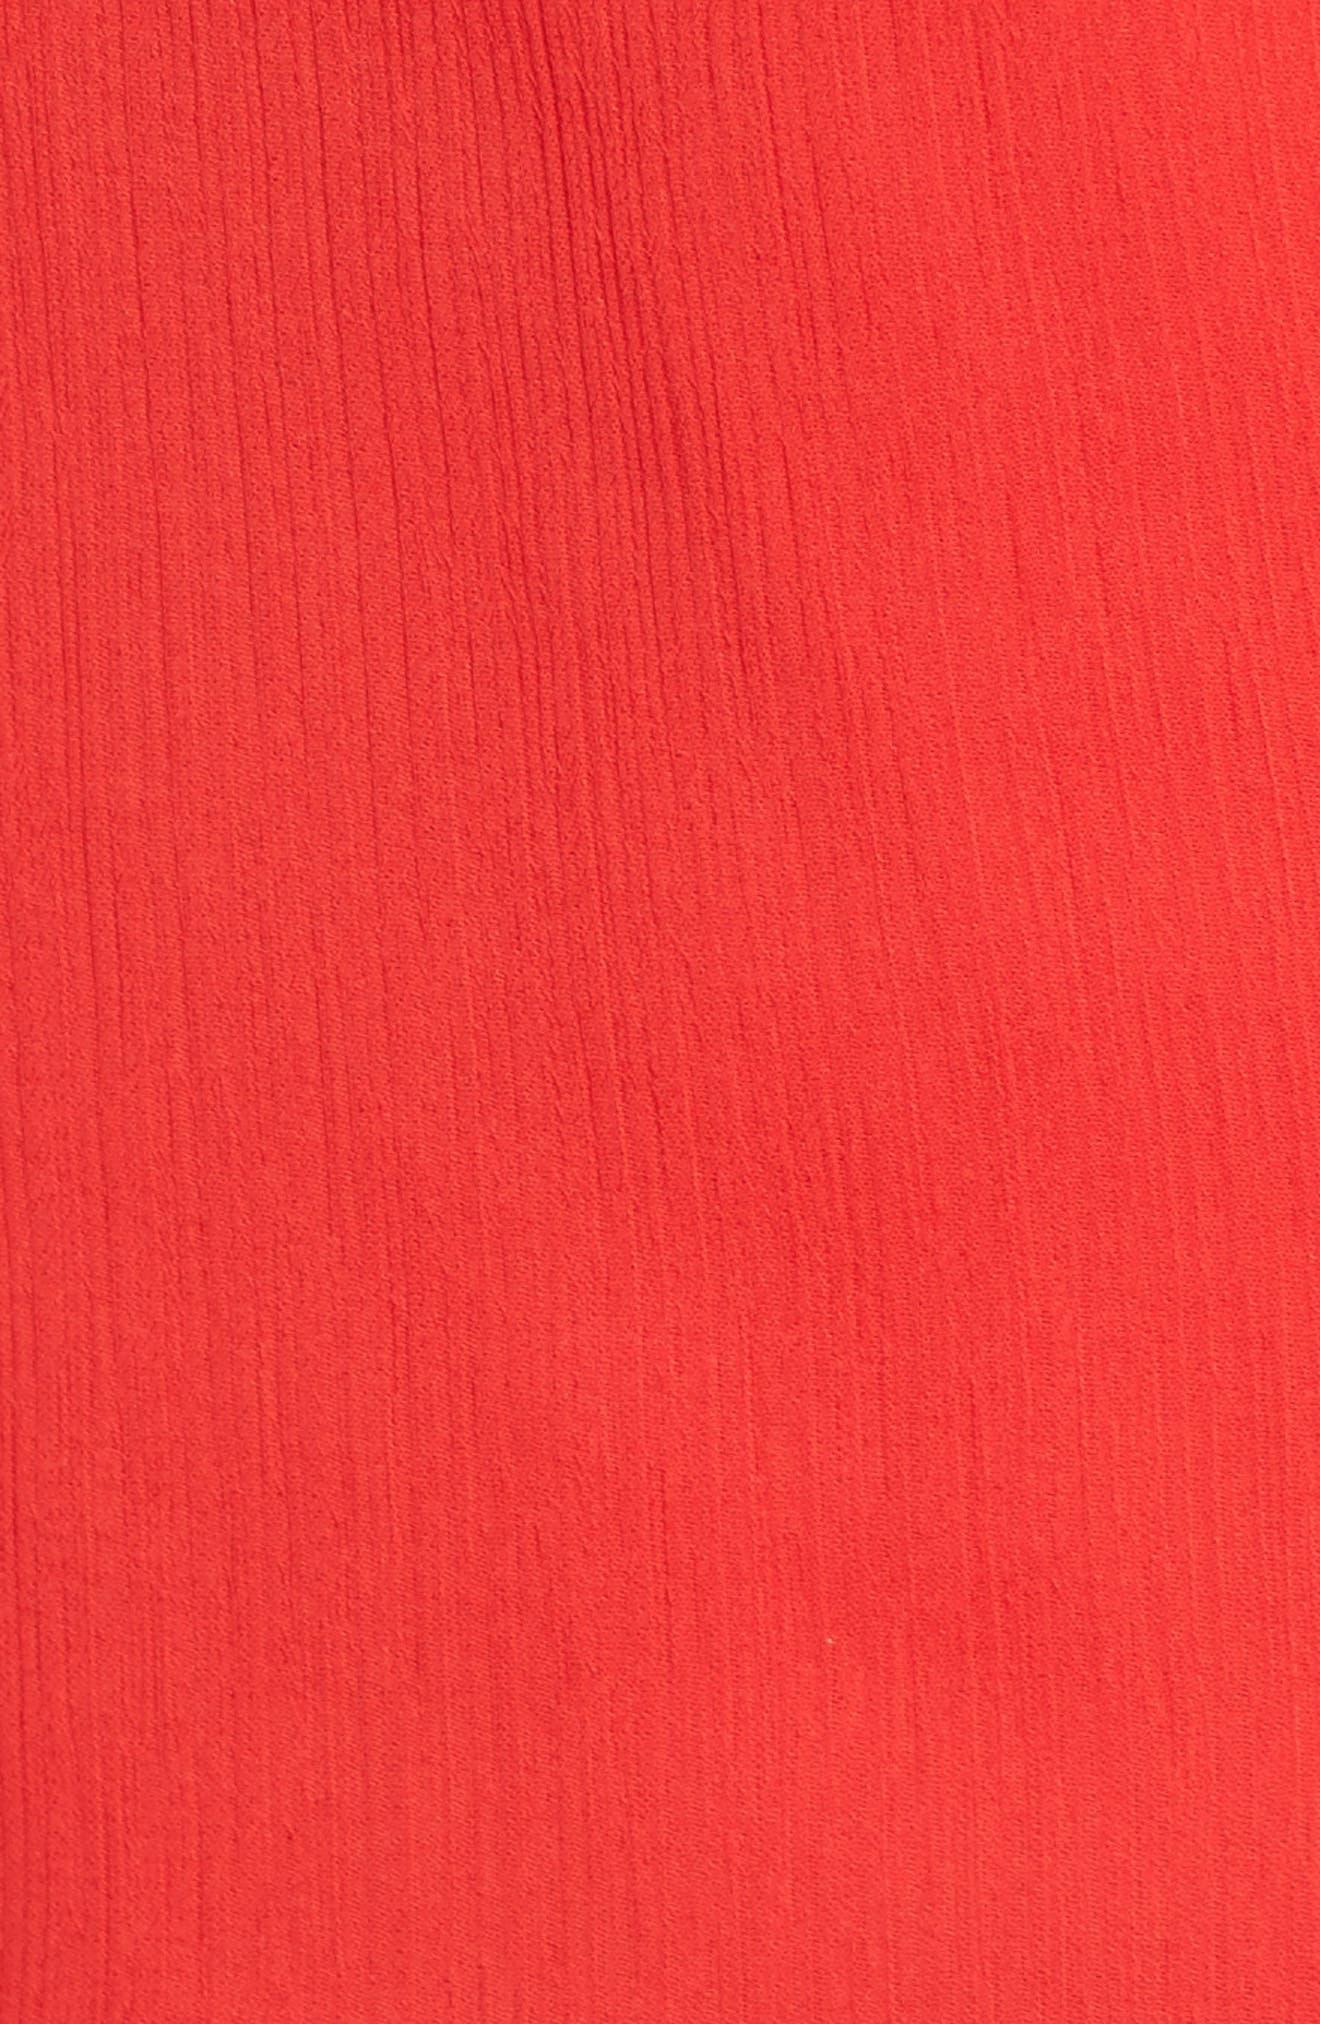 Alternate Image 5  - Tularosa Winnie Ruffle Blouse (Nordstrom Exclusive)